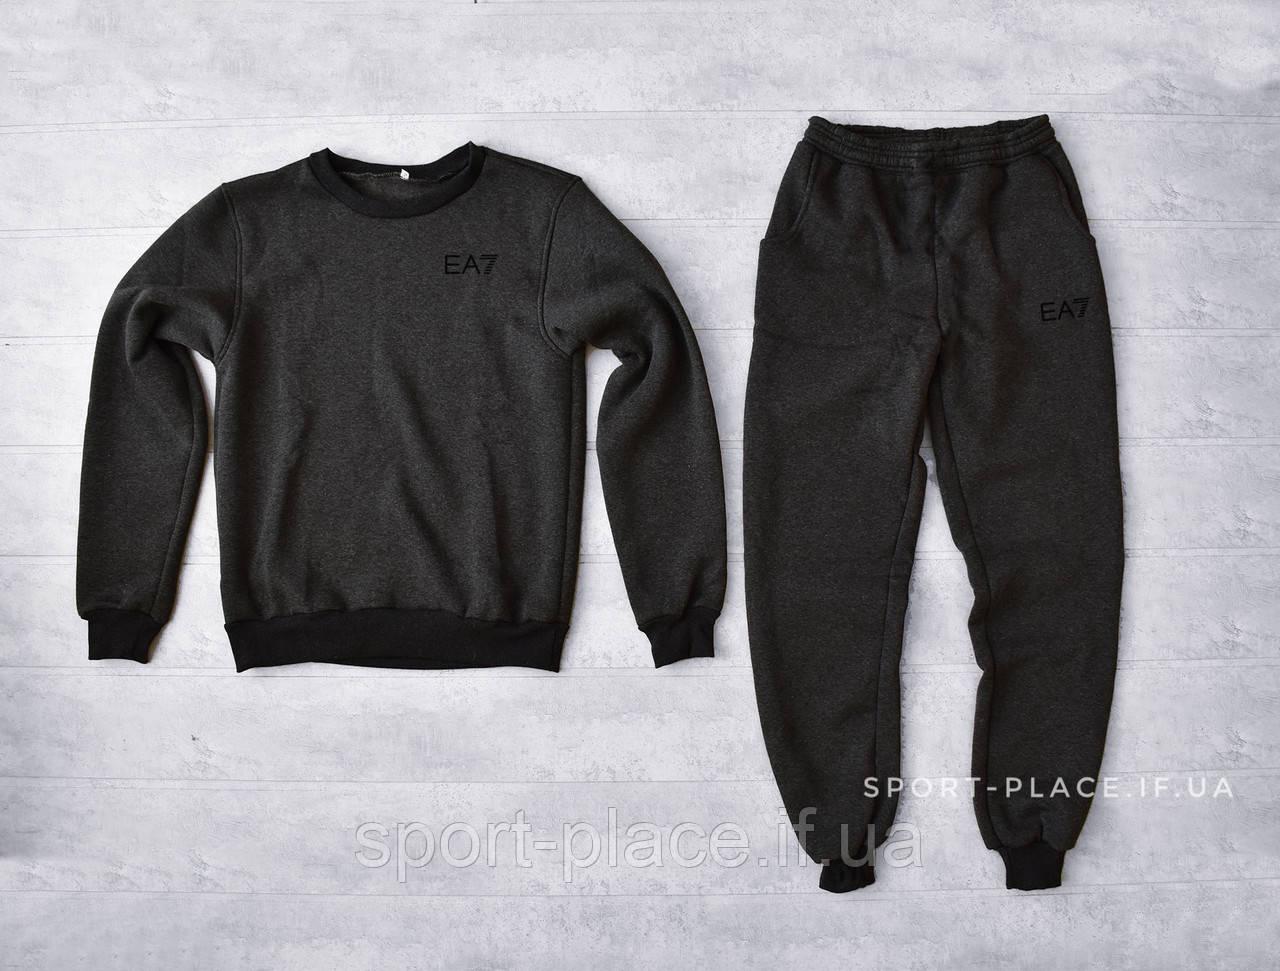 Теплый спортивный костюм Armani ea7 (Армани) темно серый (ЗИМА) с начесом, свитшот штаны толстовка лонгслив